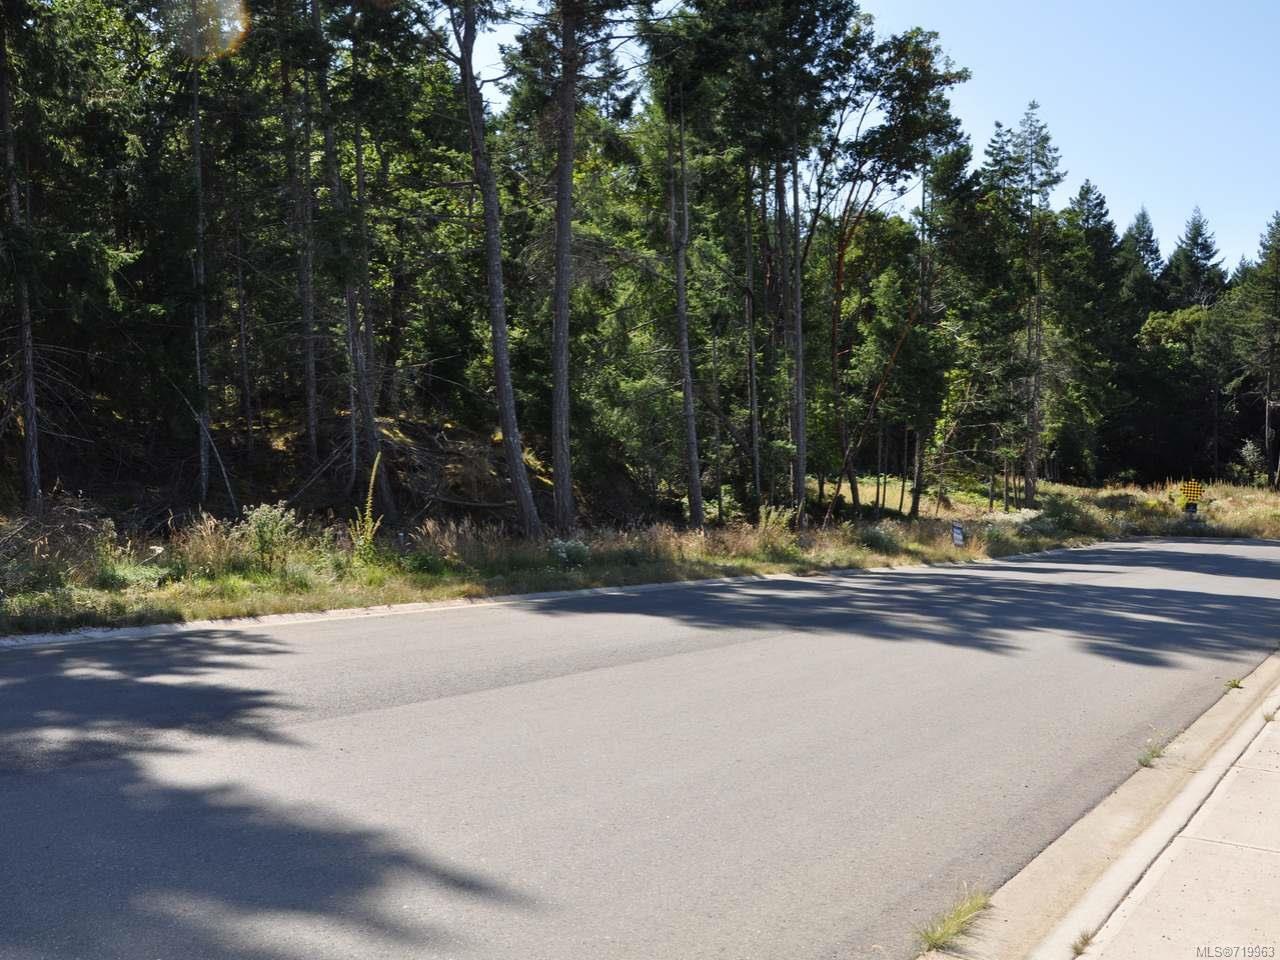 Main Photo: LOT 27 BONNINGTON DRIVE in NANOOSE BAY: PQ Fairwinds Land for sale (Parksville/Qualicum)  : MLS®# 719963